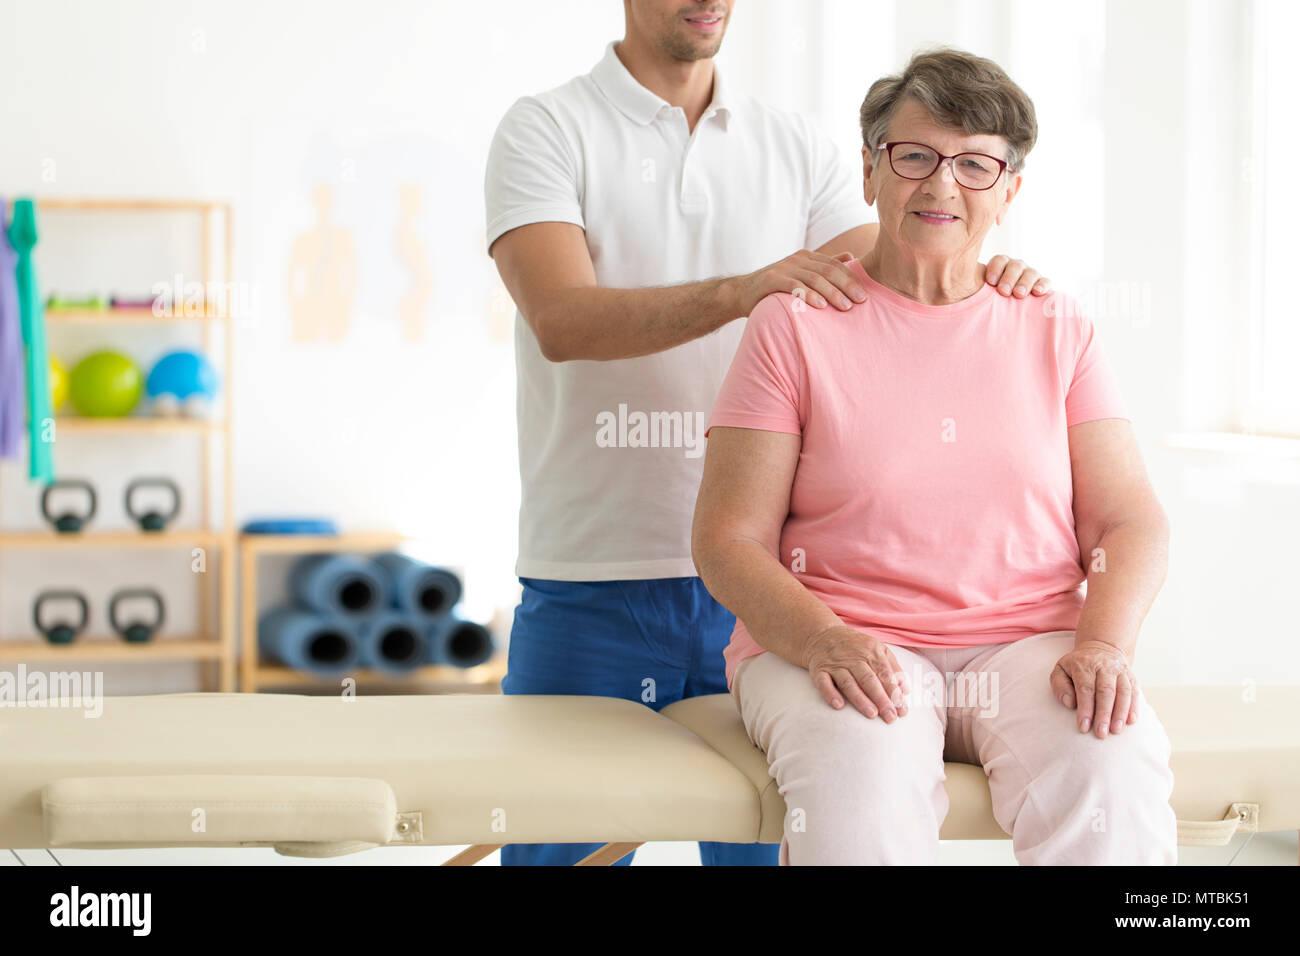 Ältere Dame durch einen Physiotherapeuten auf Physiotherapie rehabilitiert werden Stockbild